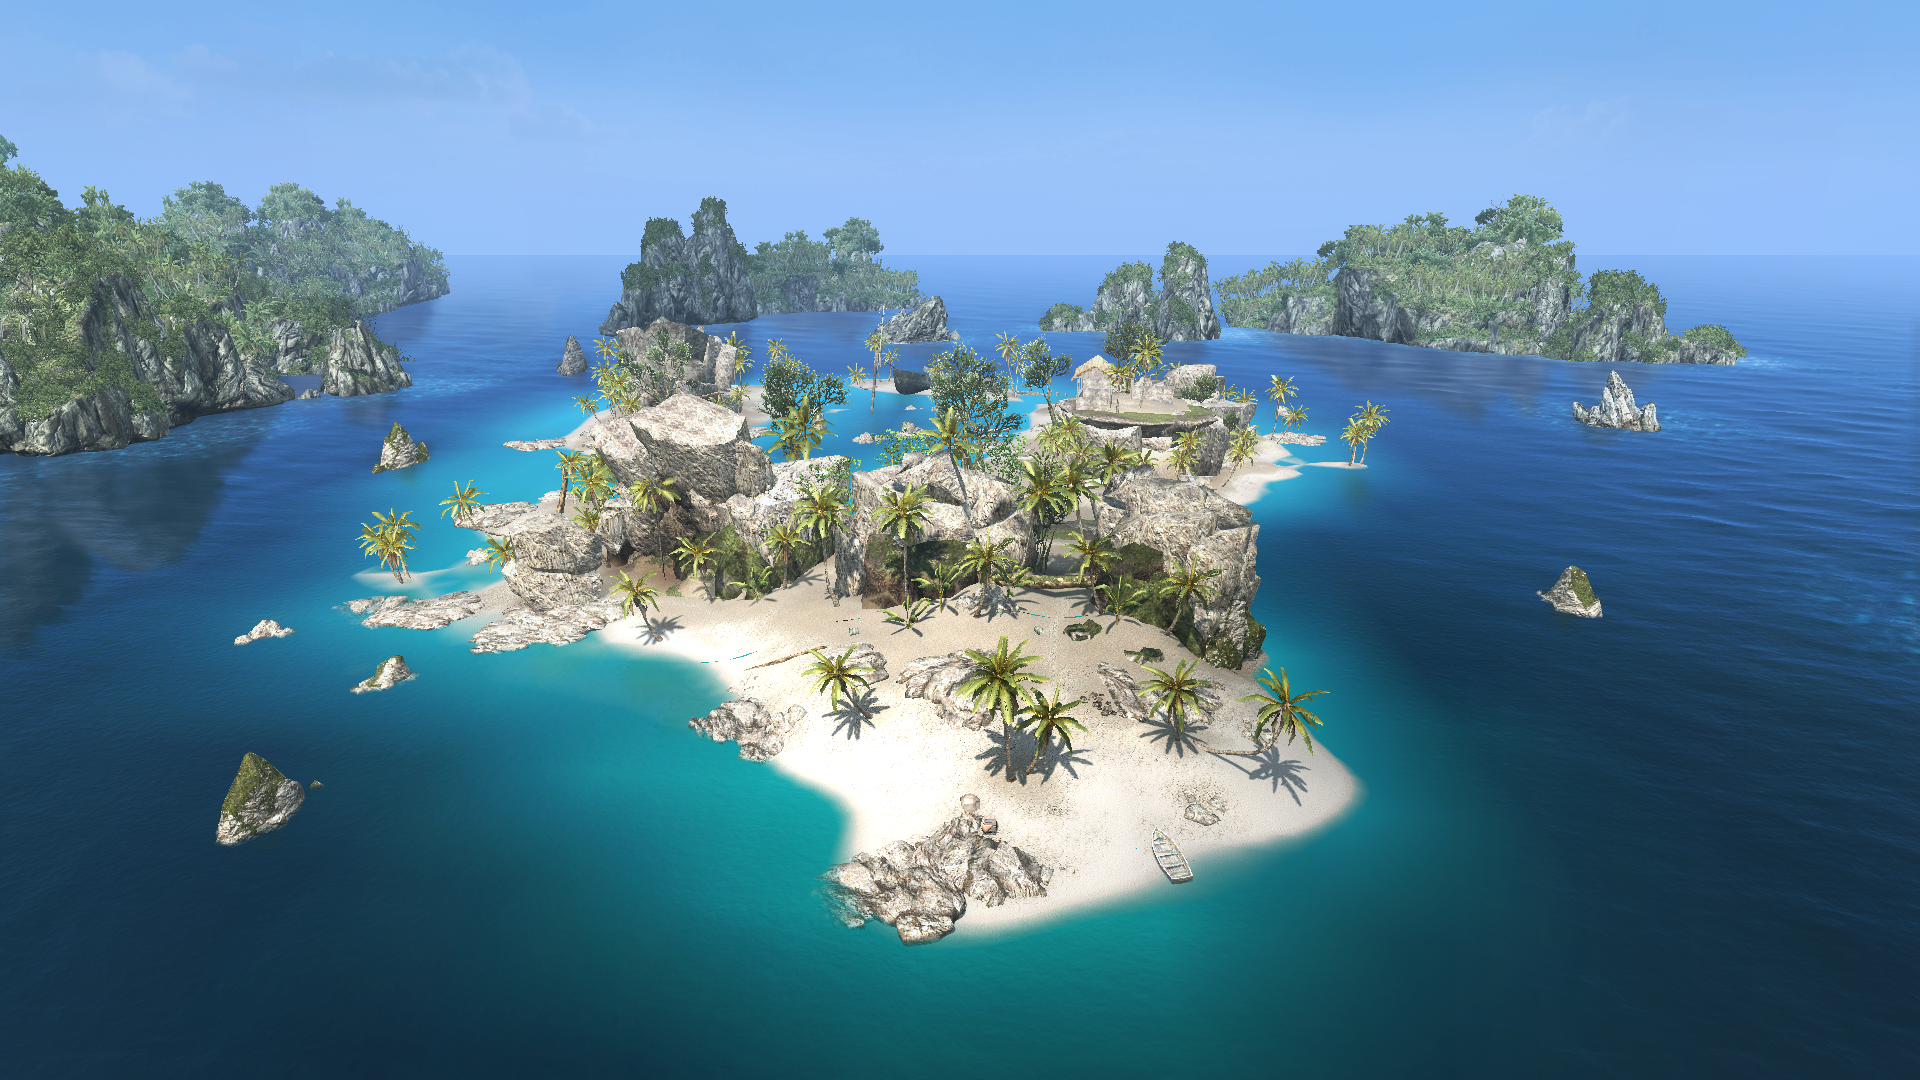 mystery island assassin s creed wiki fandom powered by wikia